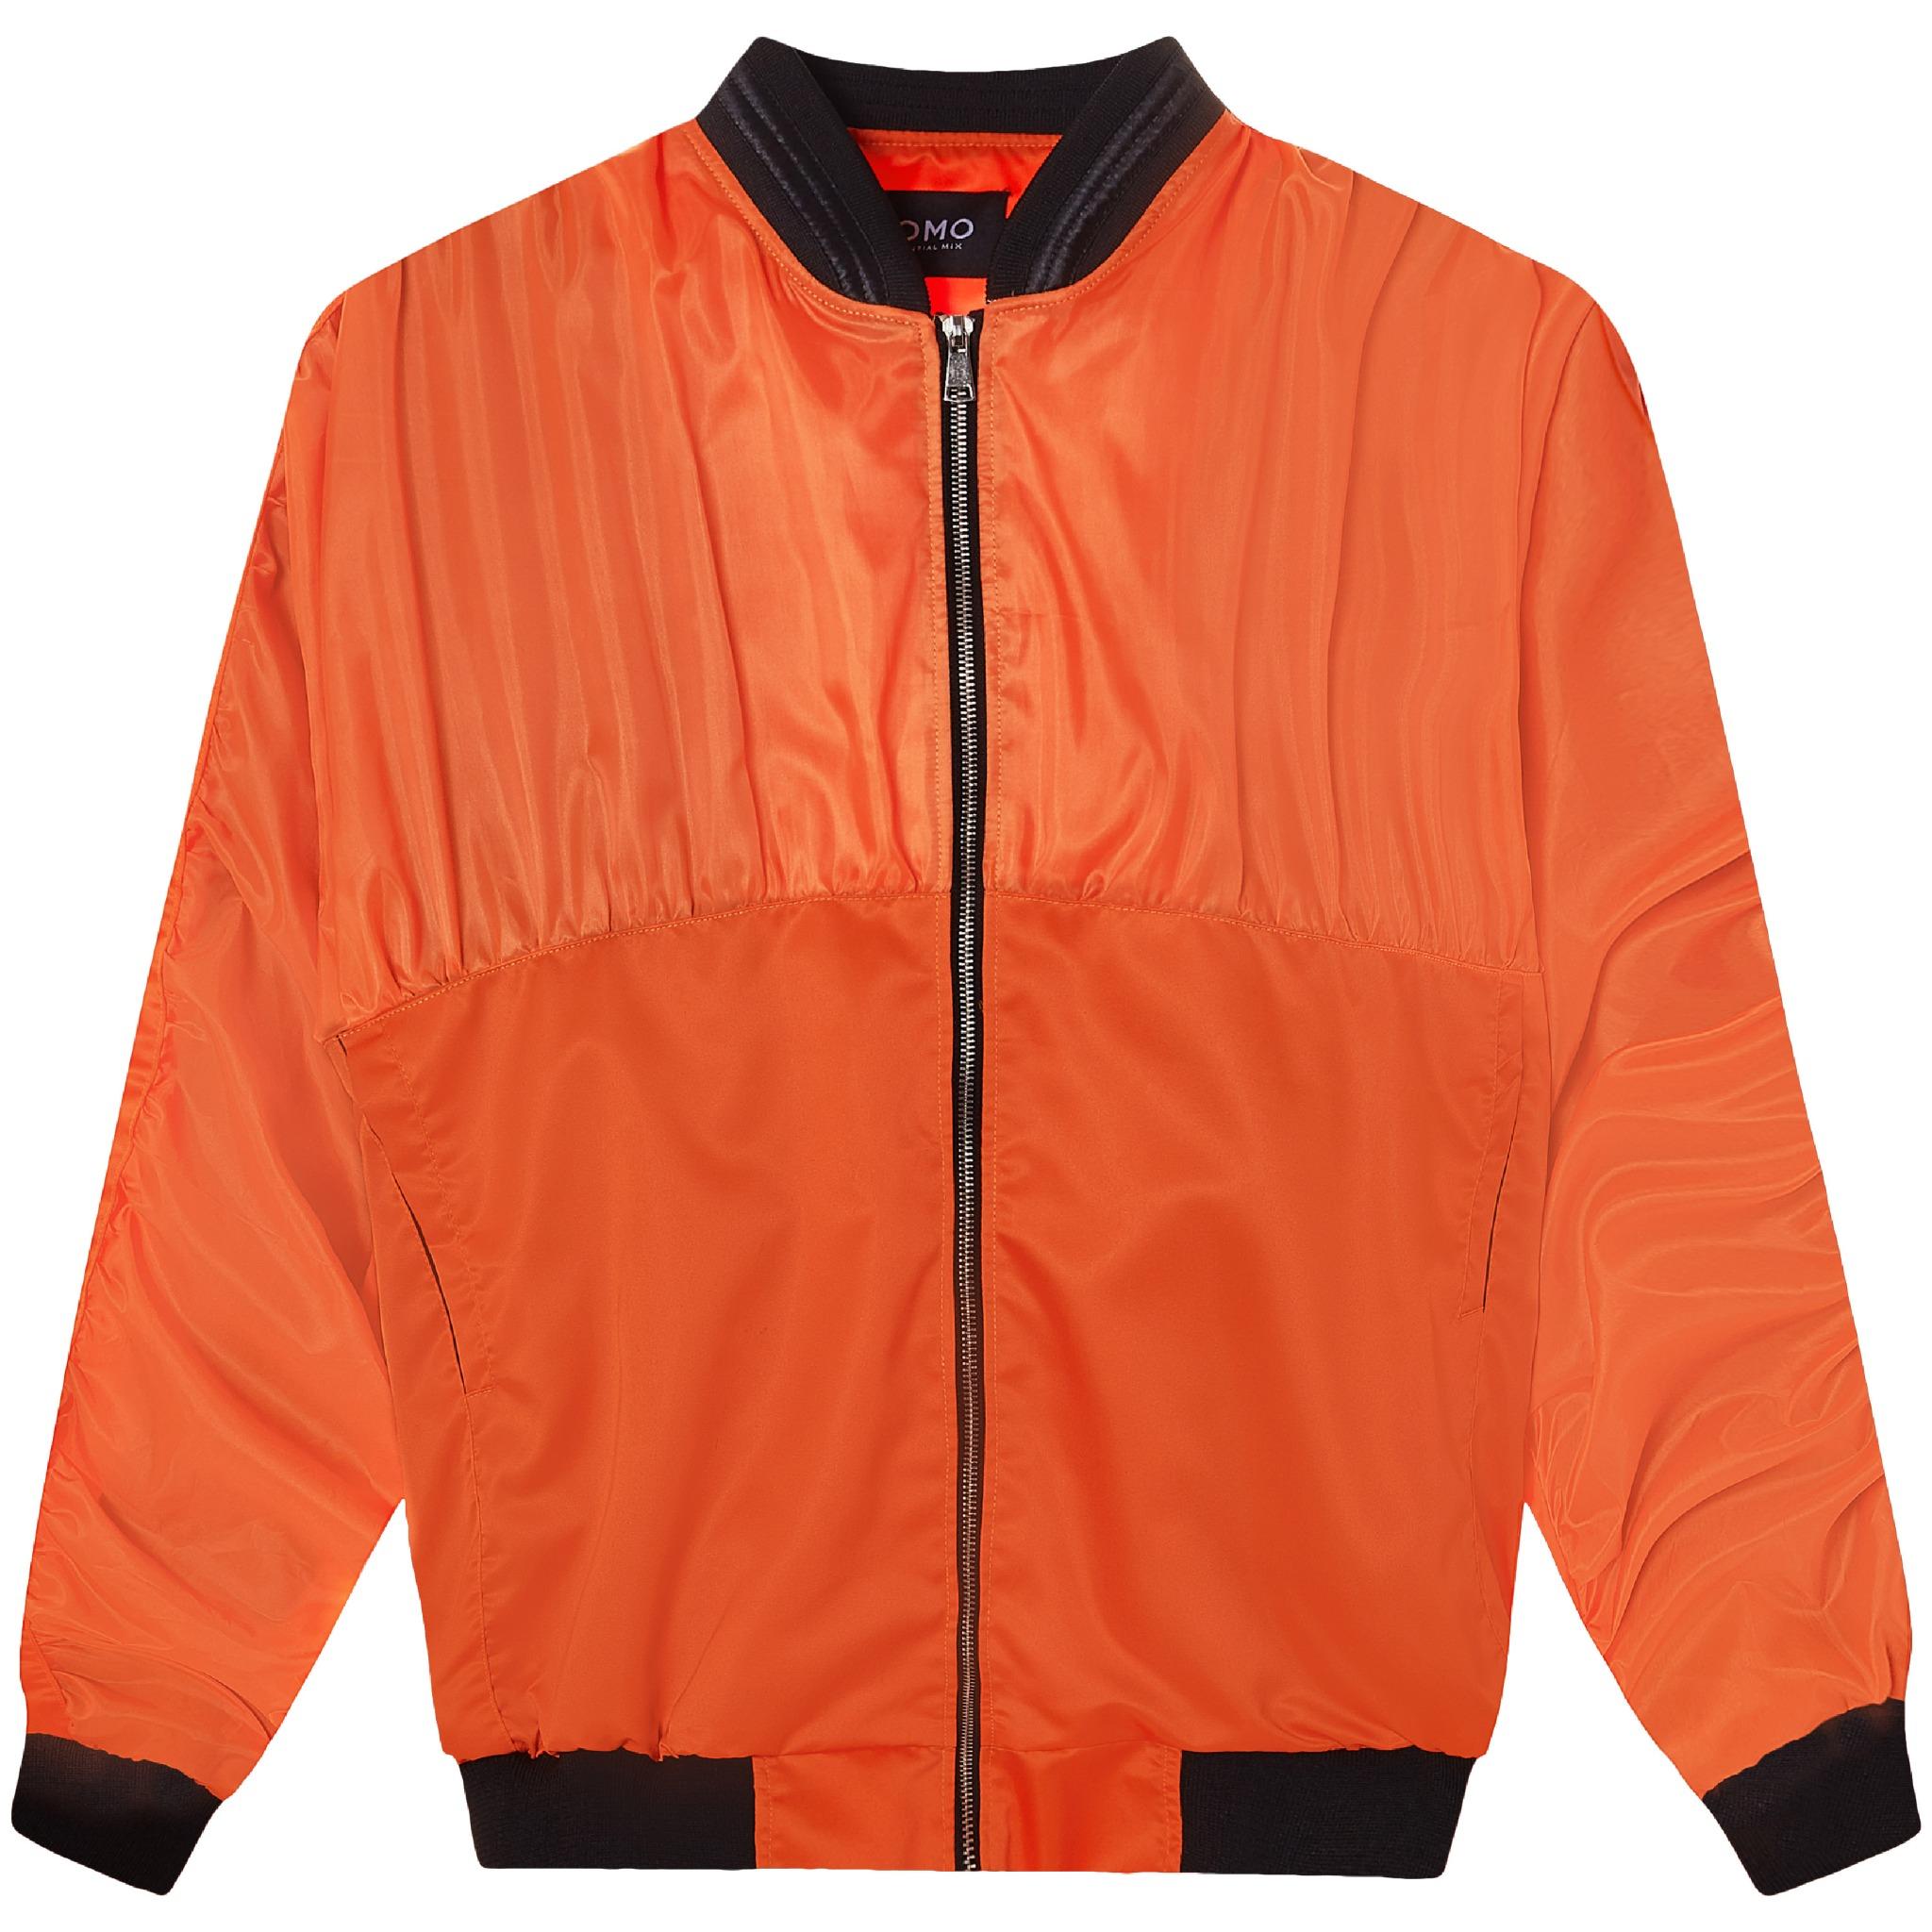 FOAM BOMBER JACKET/Orange